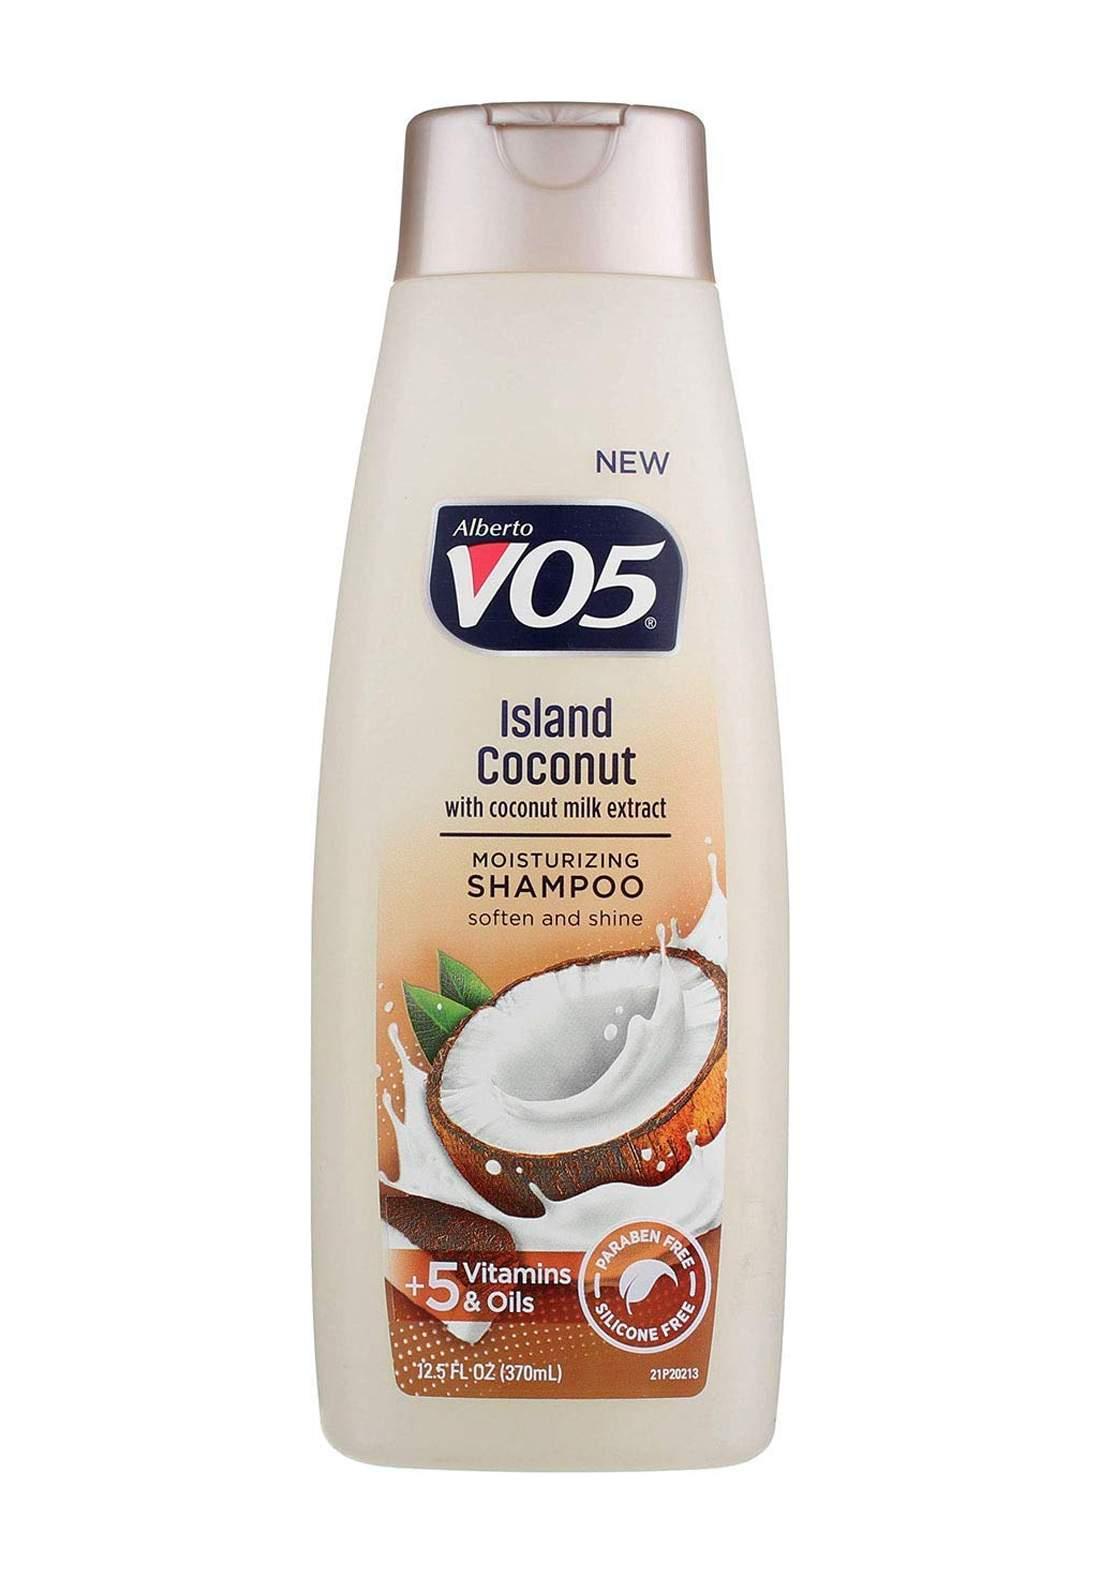 VO5 Island Coconut with Coconut Milk Moisturizing Shampoo 370ml  شامبو مرطب